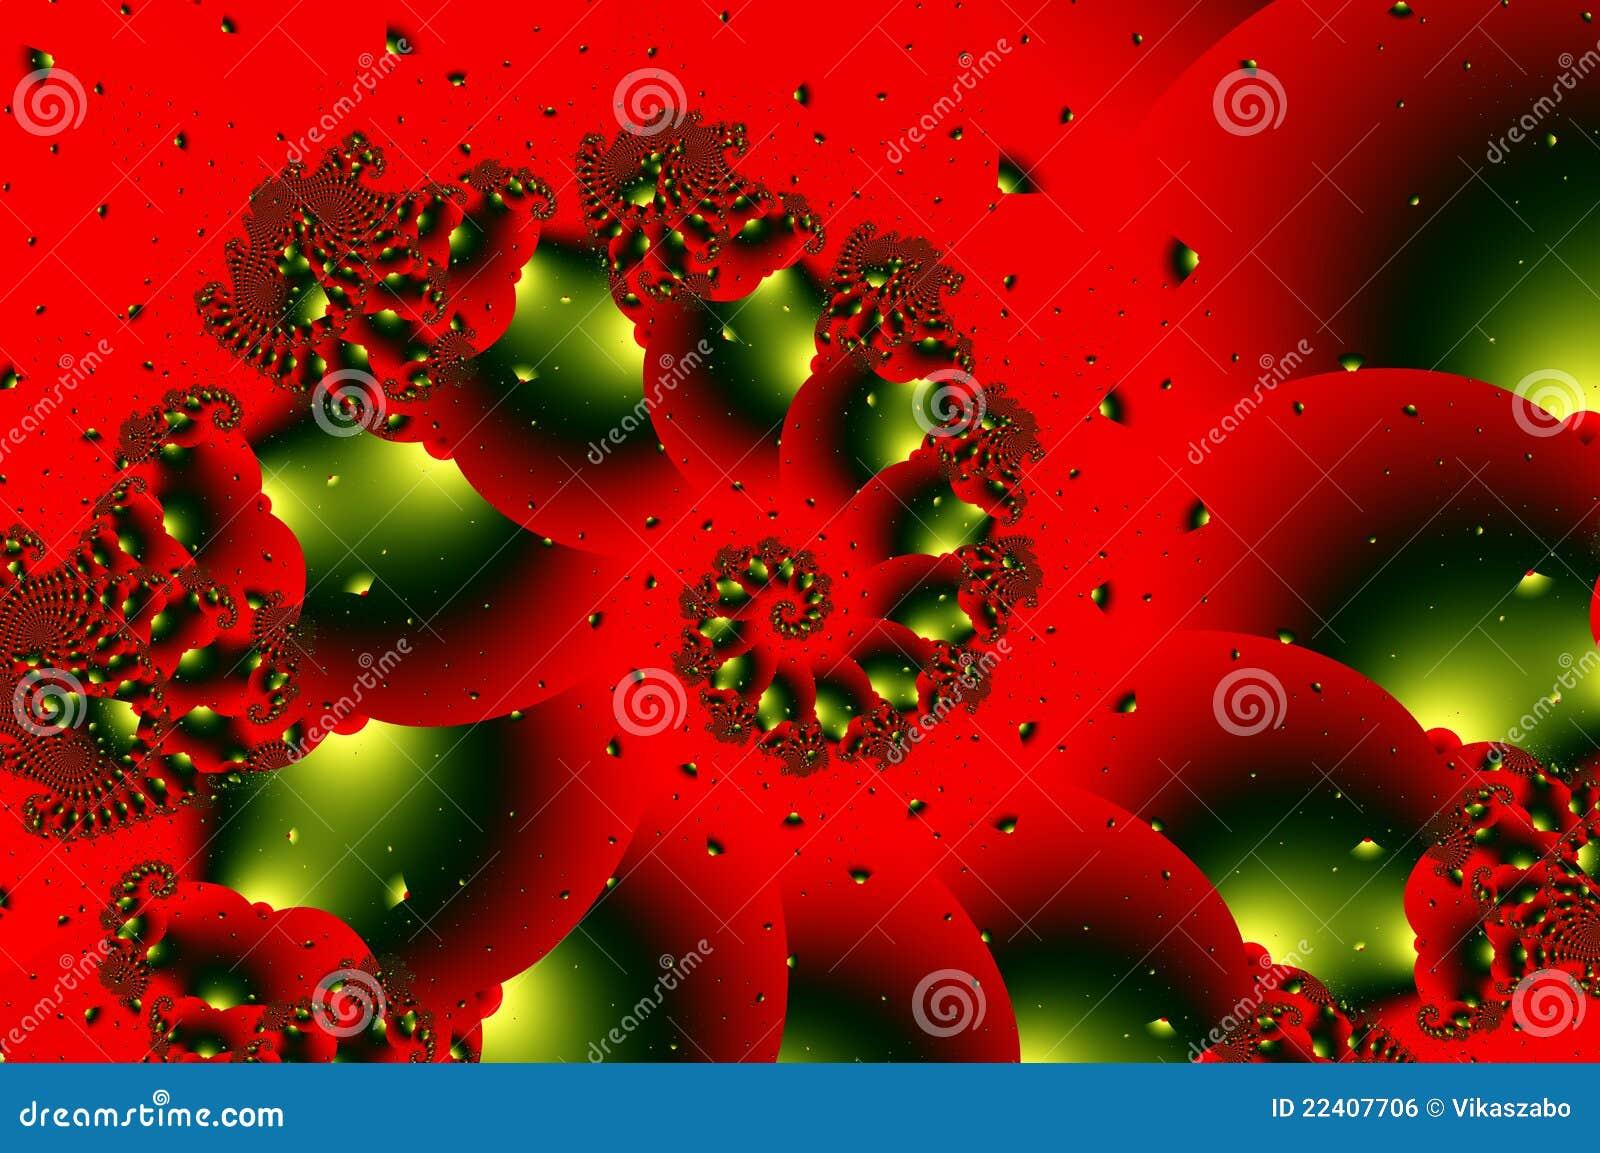 illustration fractal background clocks - photo #33